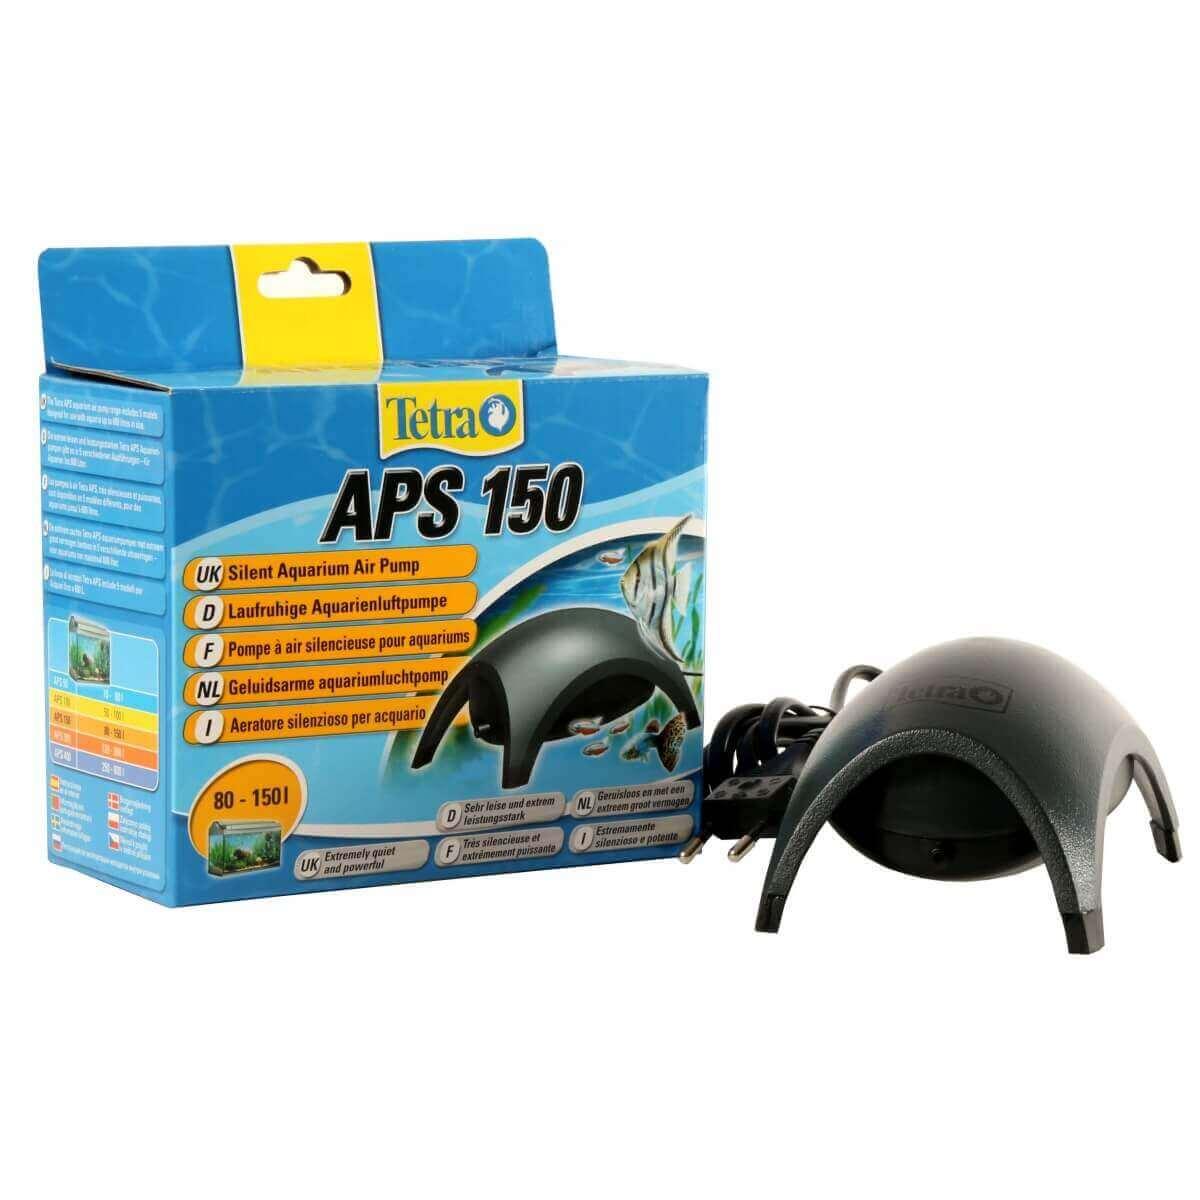 pompe air tetra aps design et silencieuse pompe air. Black Bedroom Furniture Sets. Home Design Ideas